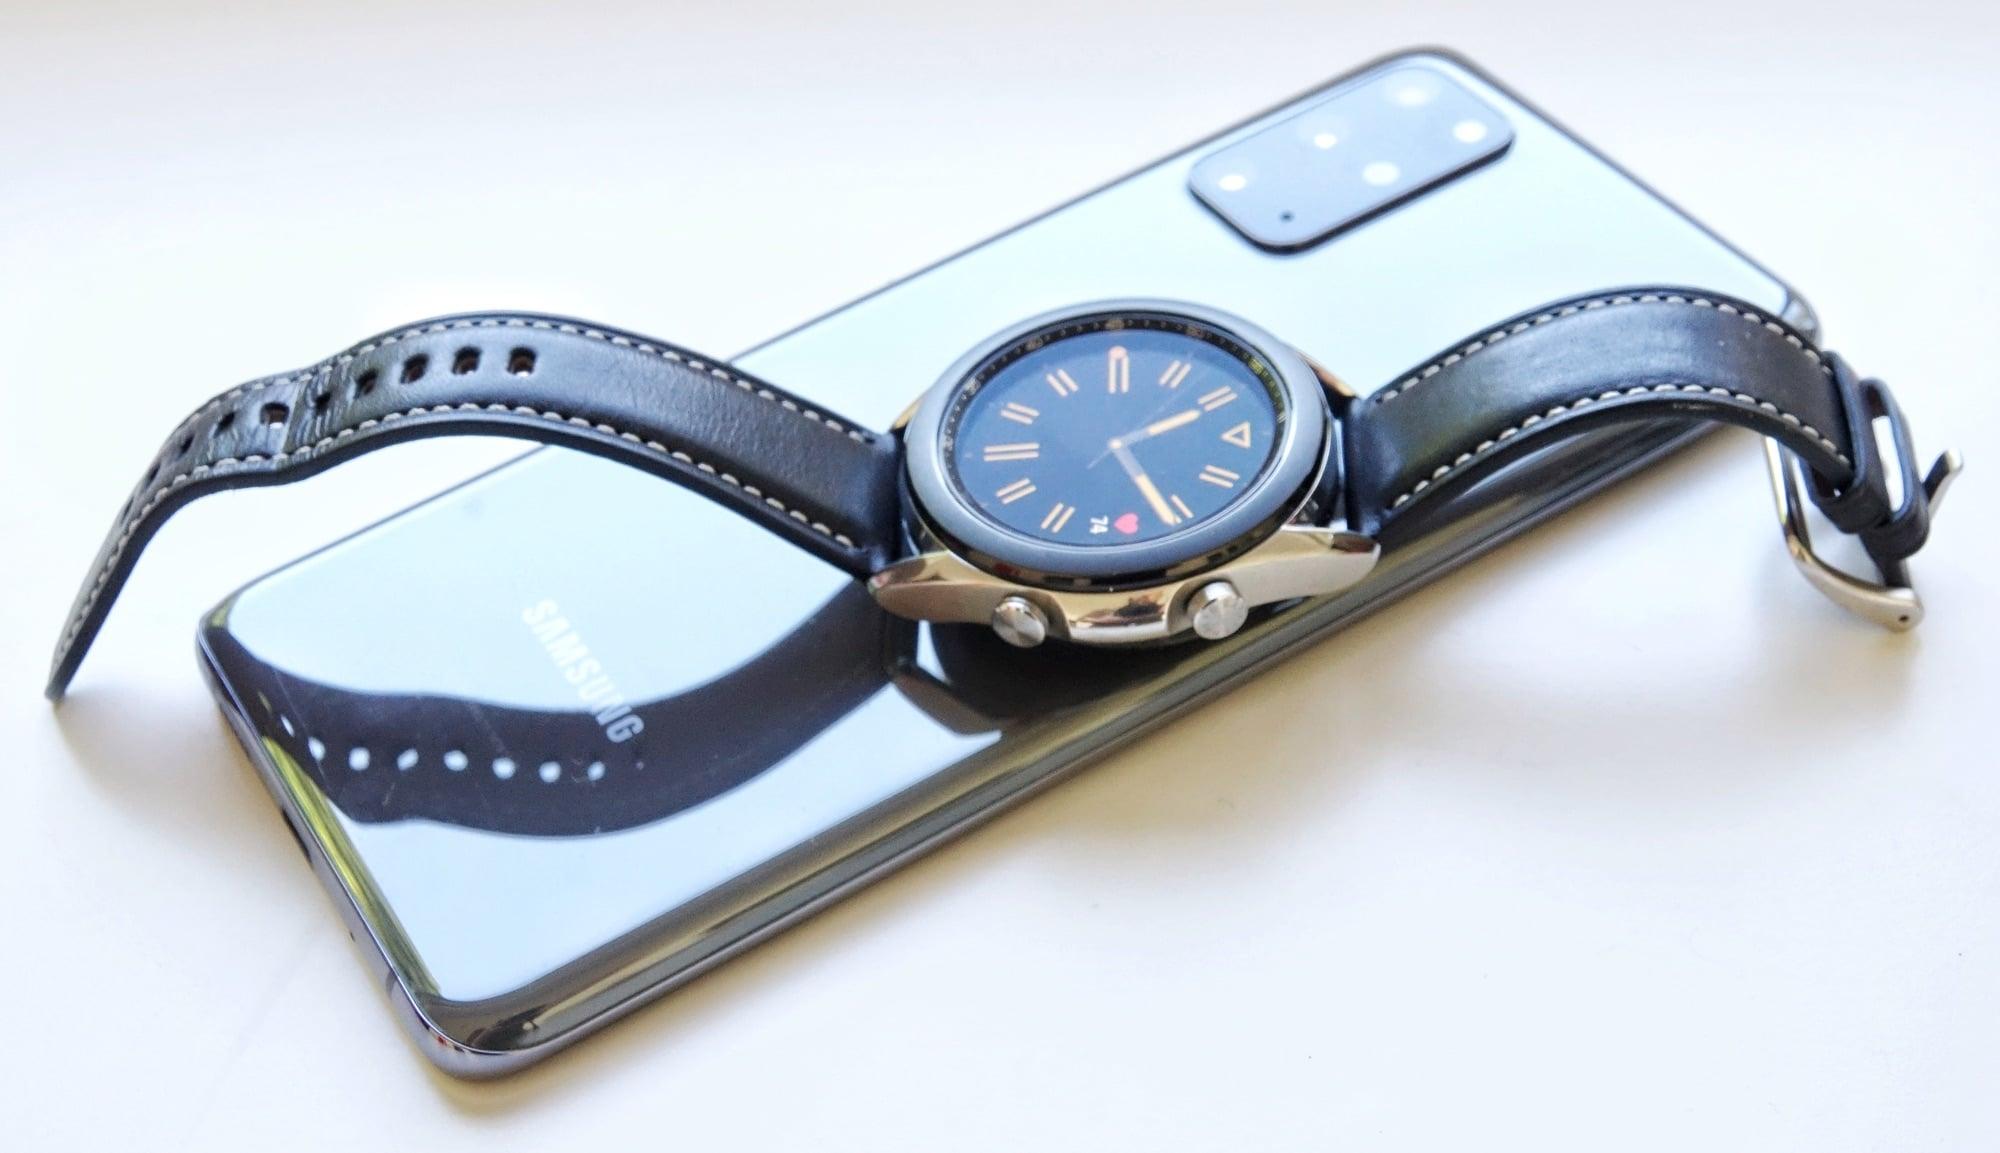 Samsung Galaxy Watch3 on the Samsung Galaxy S20+